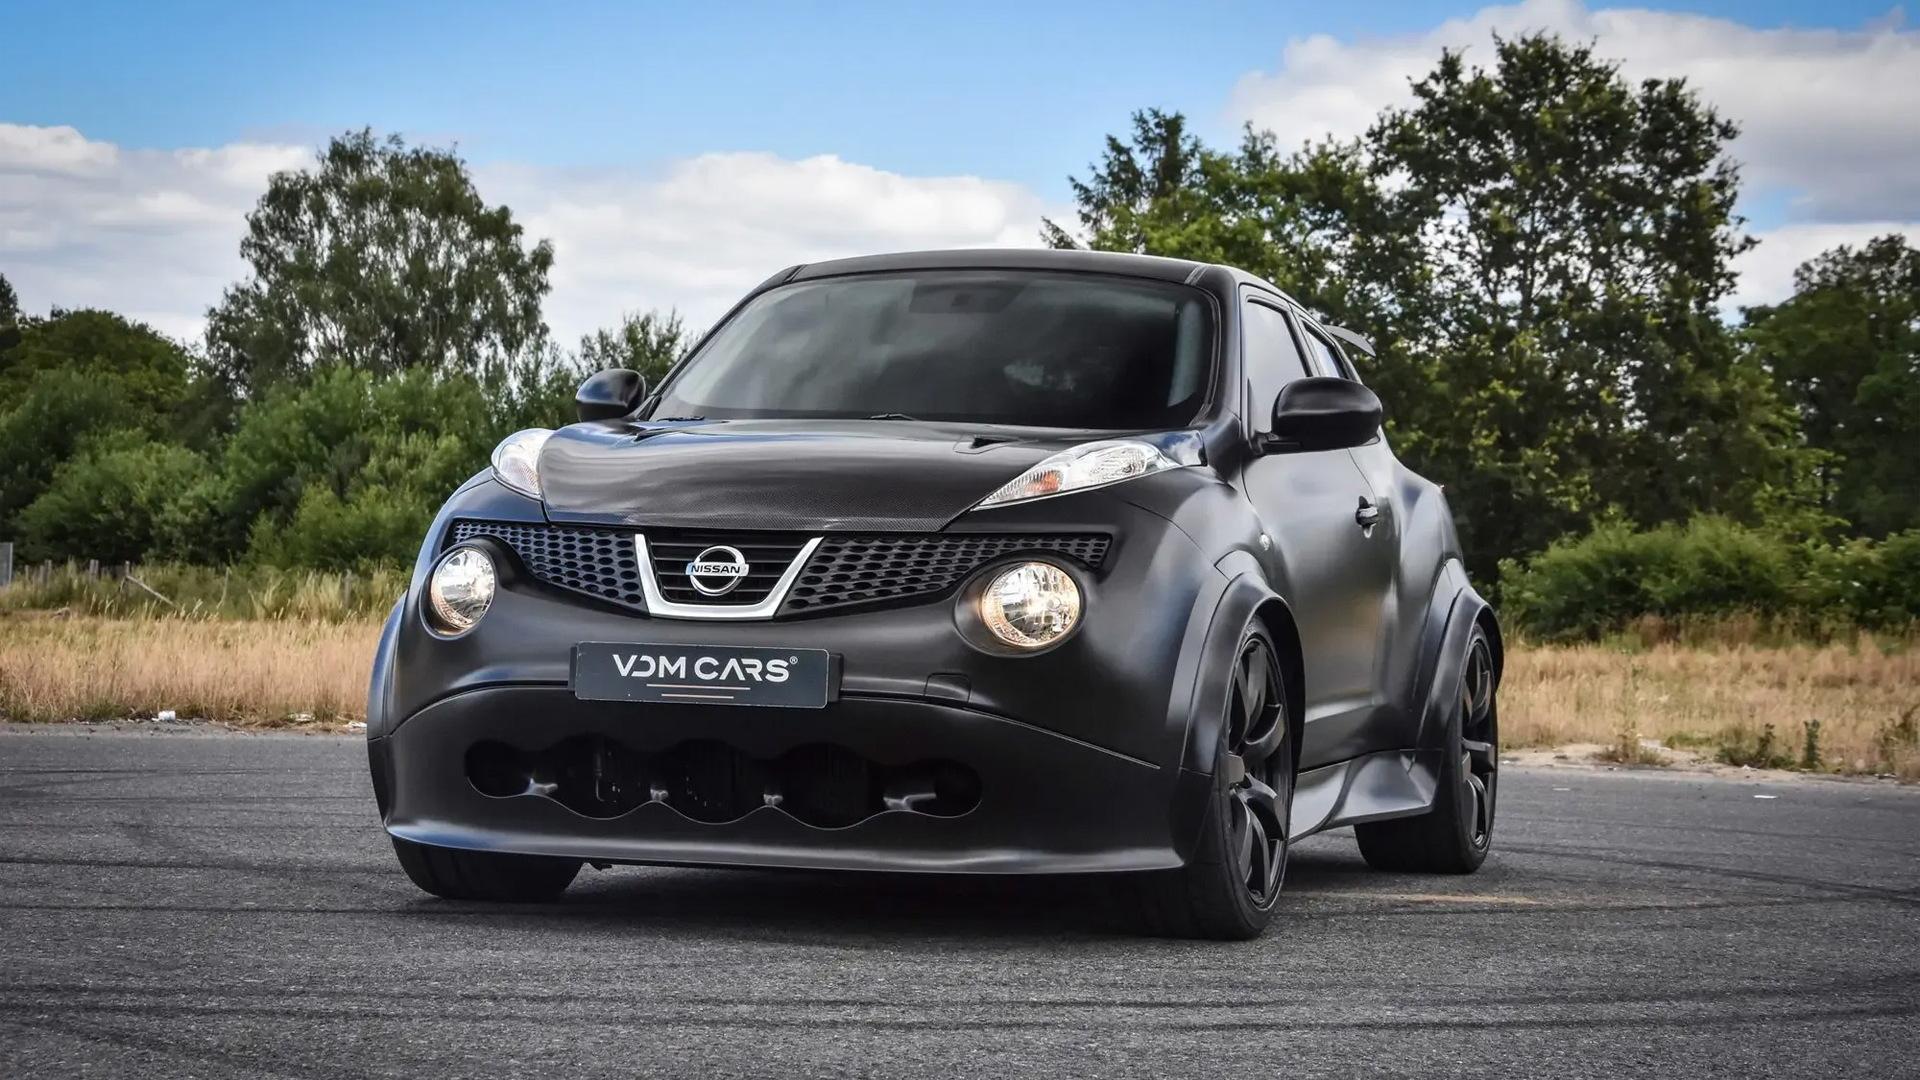 Nissan Juke-R - Photo credit: James Edition/VDM Cars